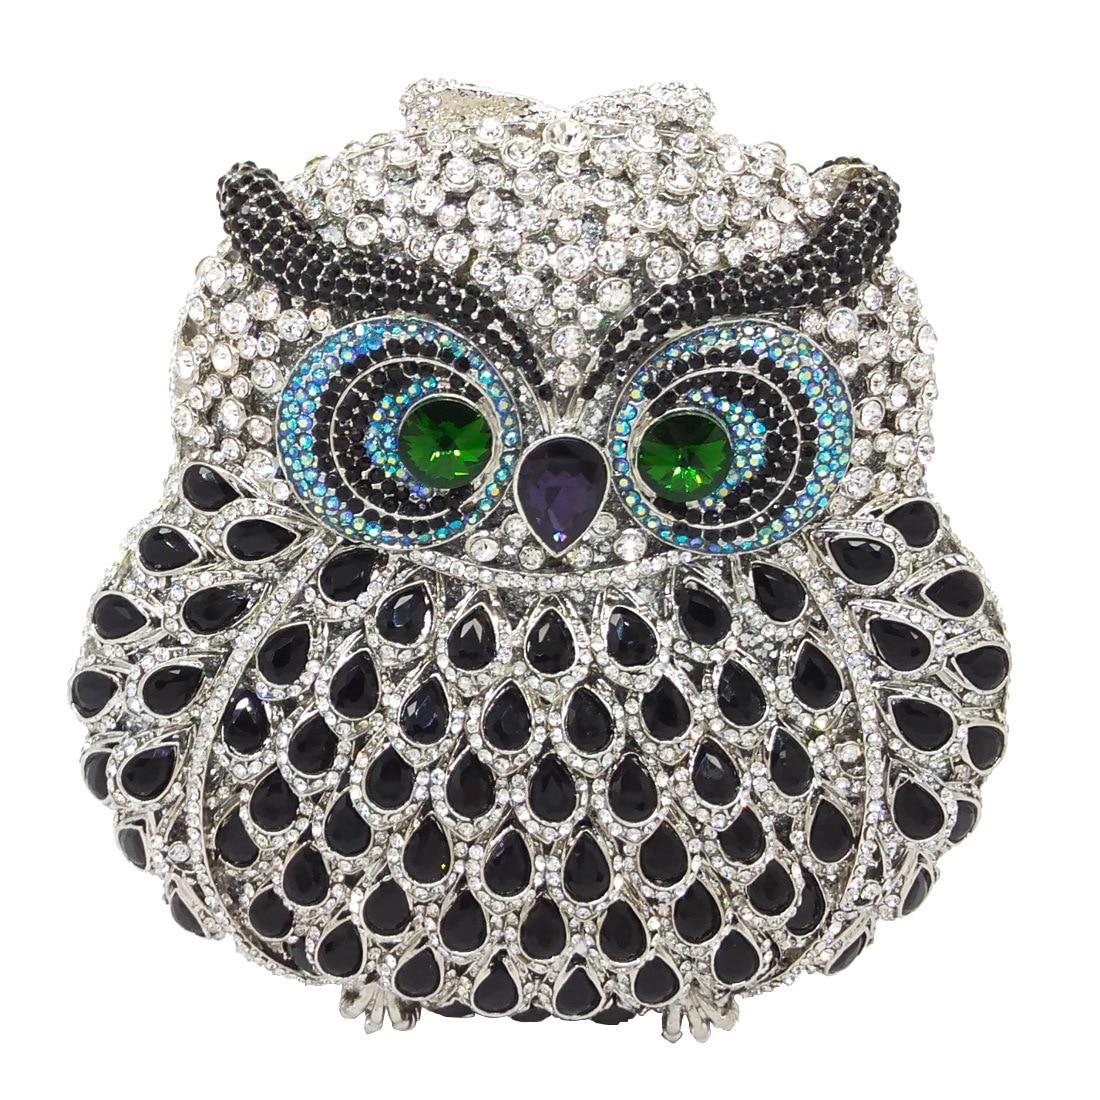 Bags for Women Owl Women Diamond Evening Clutch Bag Party Crystals Clutches Wedding Purses Ladies Hollow Out Handbags Bolsas